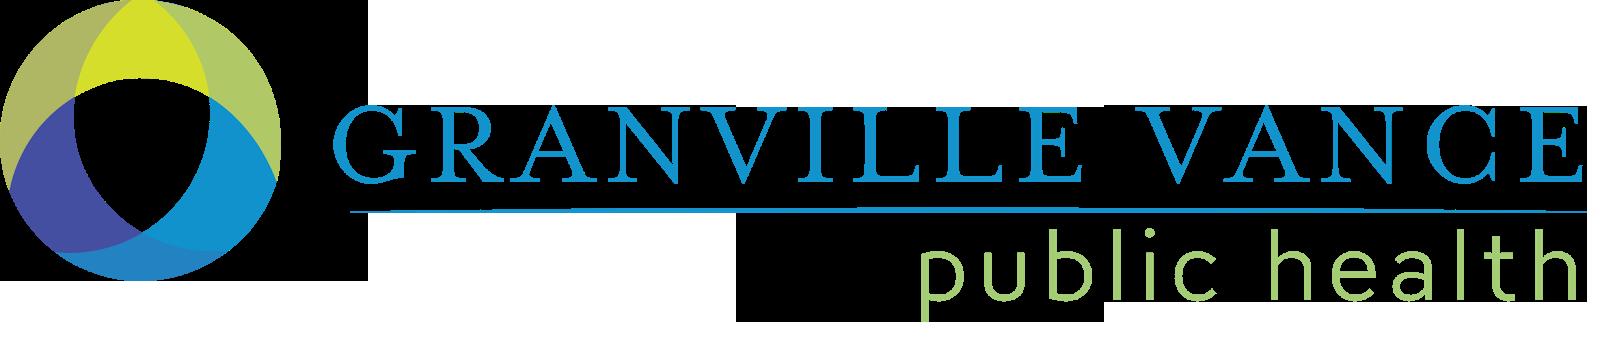 Granville Vance Public Health